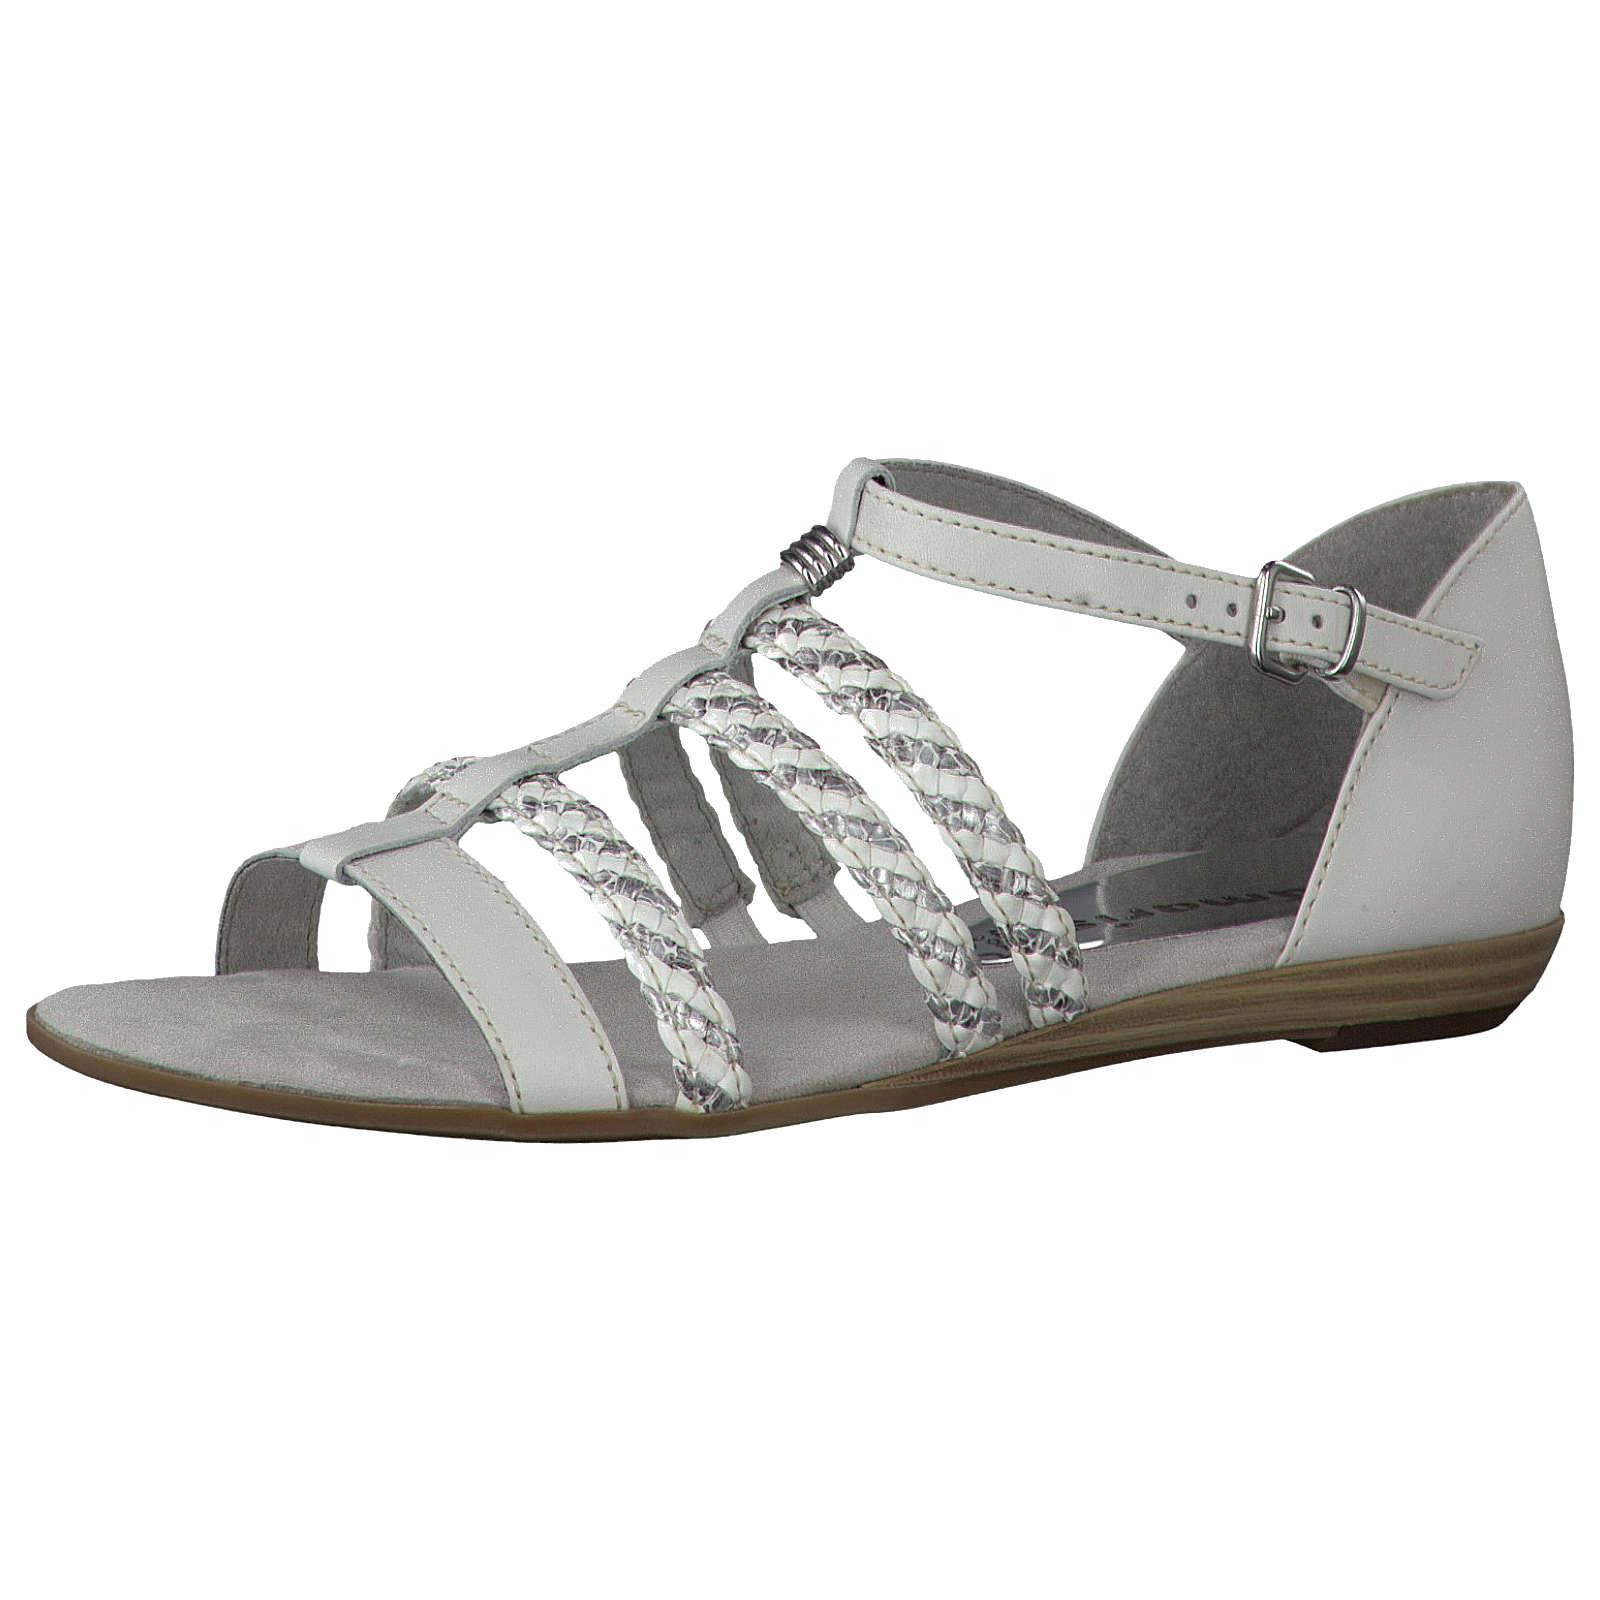 Tamaris Verbena Sandaletten grau Damen Gr. 38